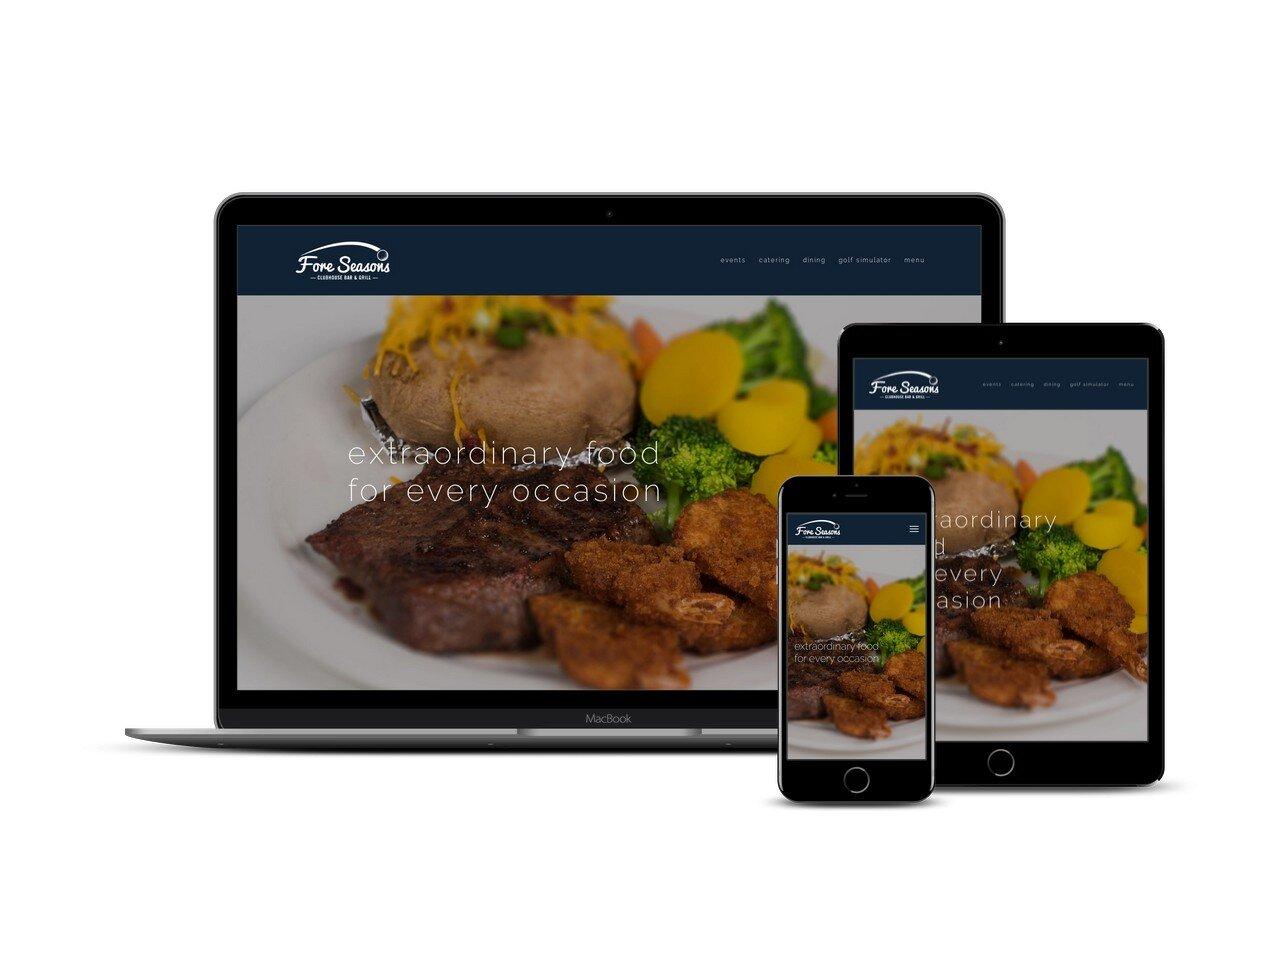 minneapolis-one-day-websites-one-wheel-marketing.jpg